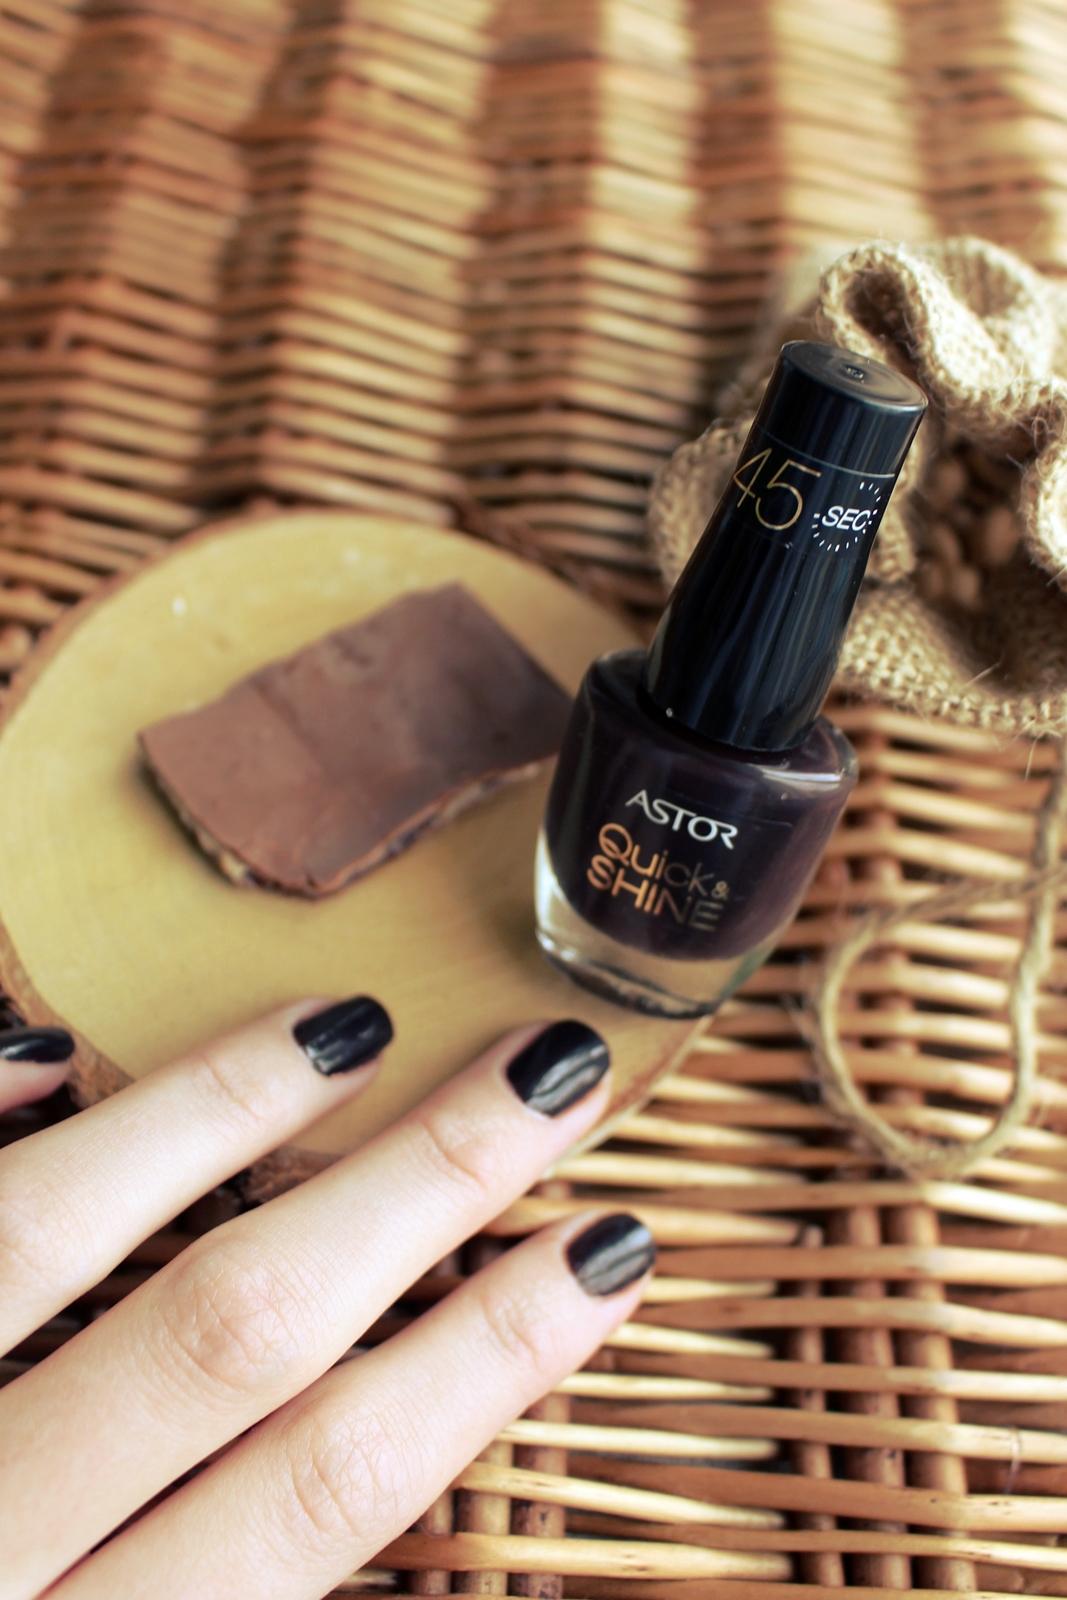 Astor Quick & Shine, 616 Dark Chocolate